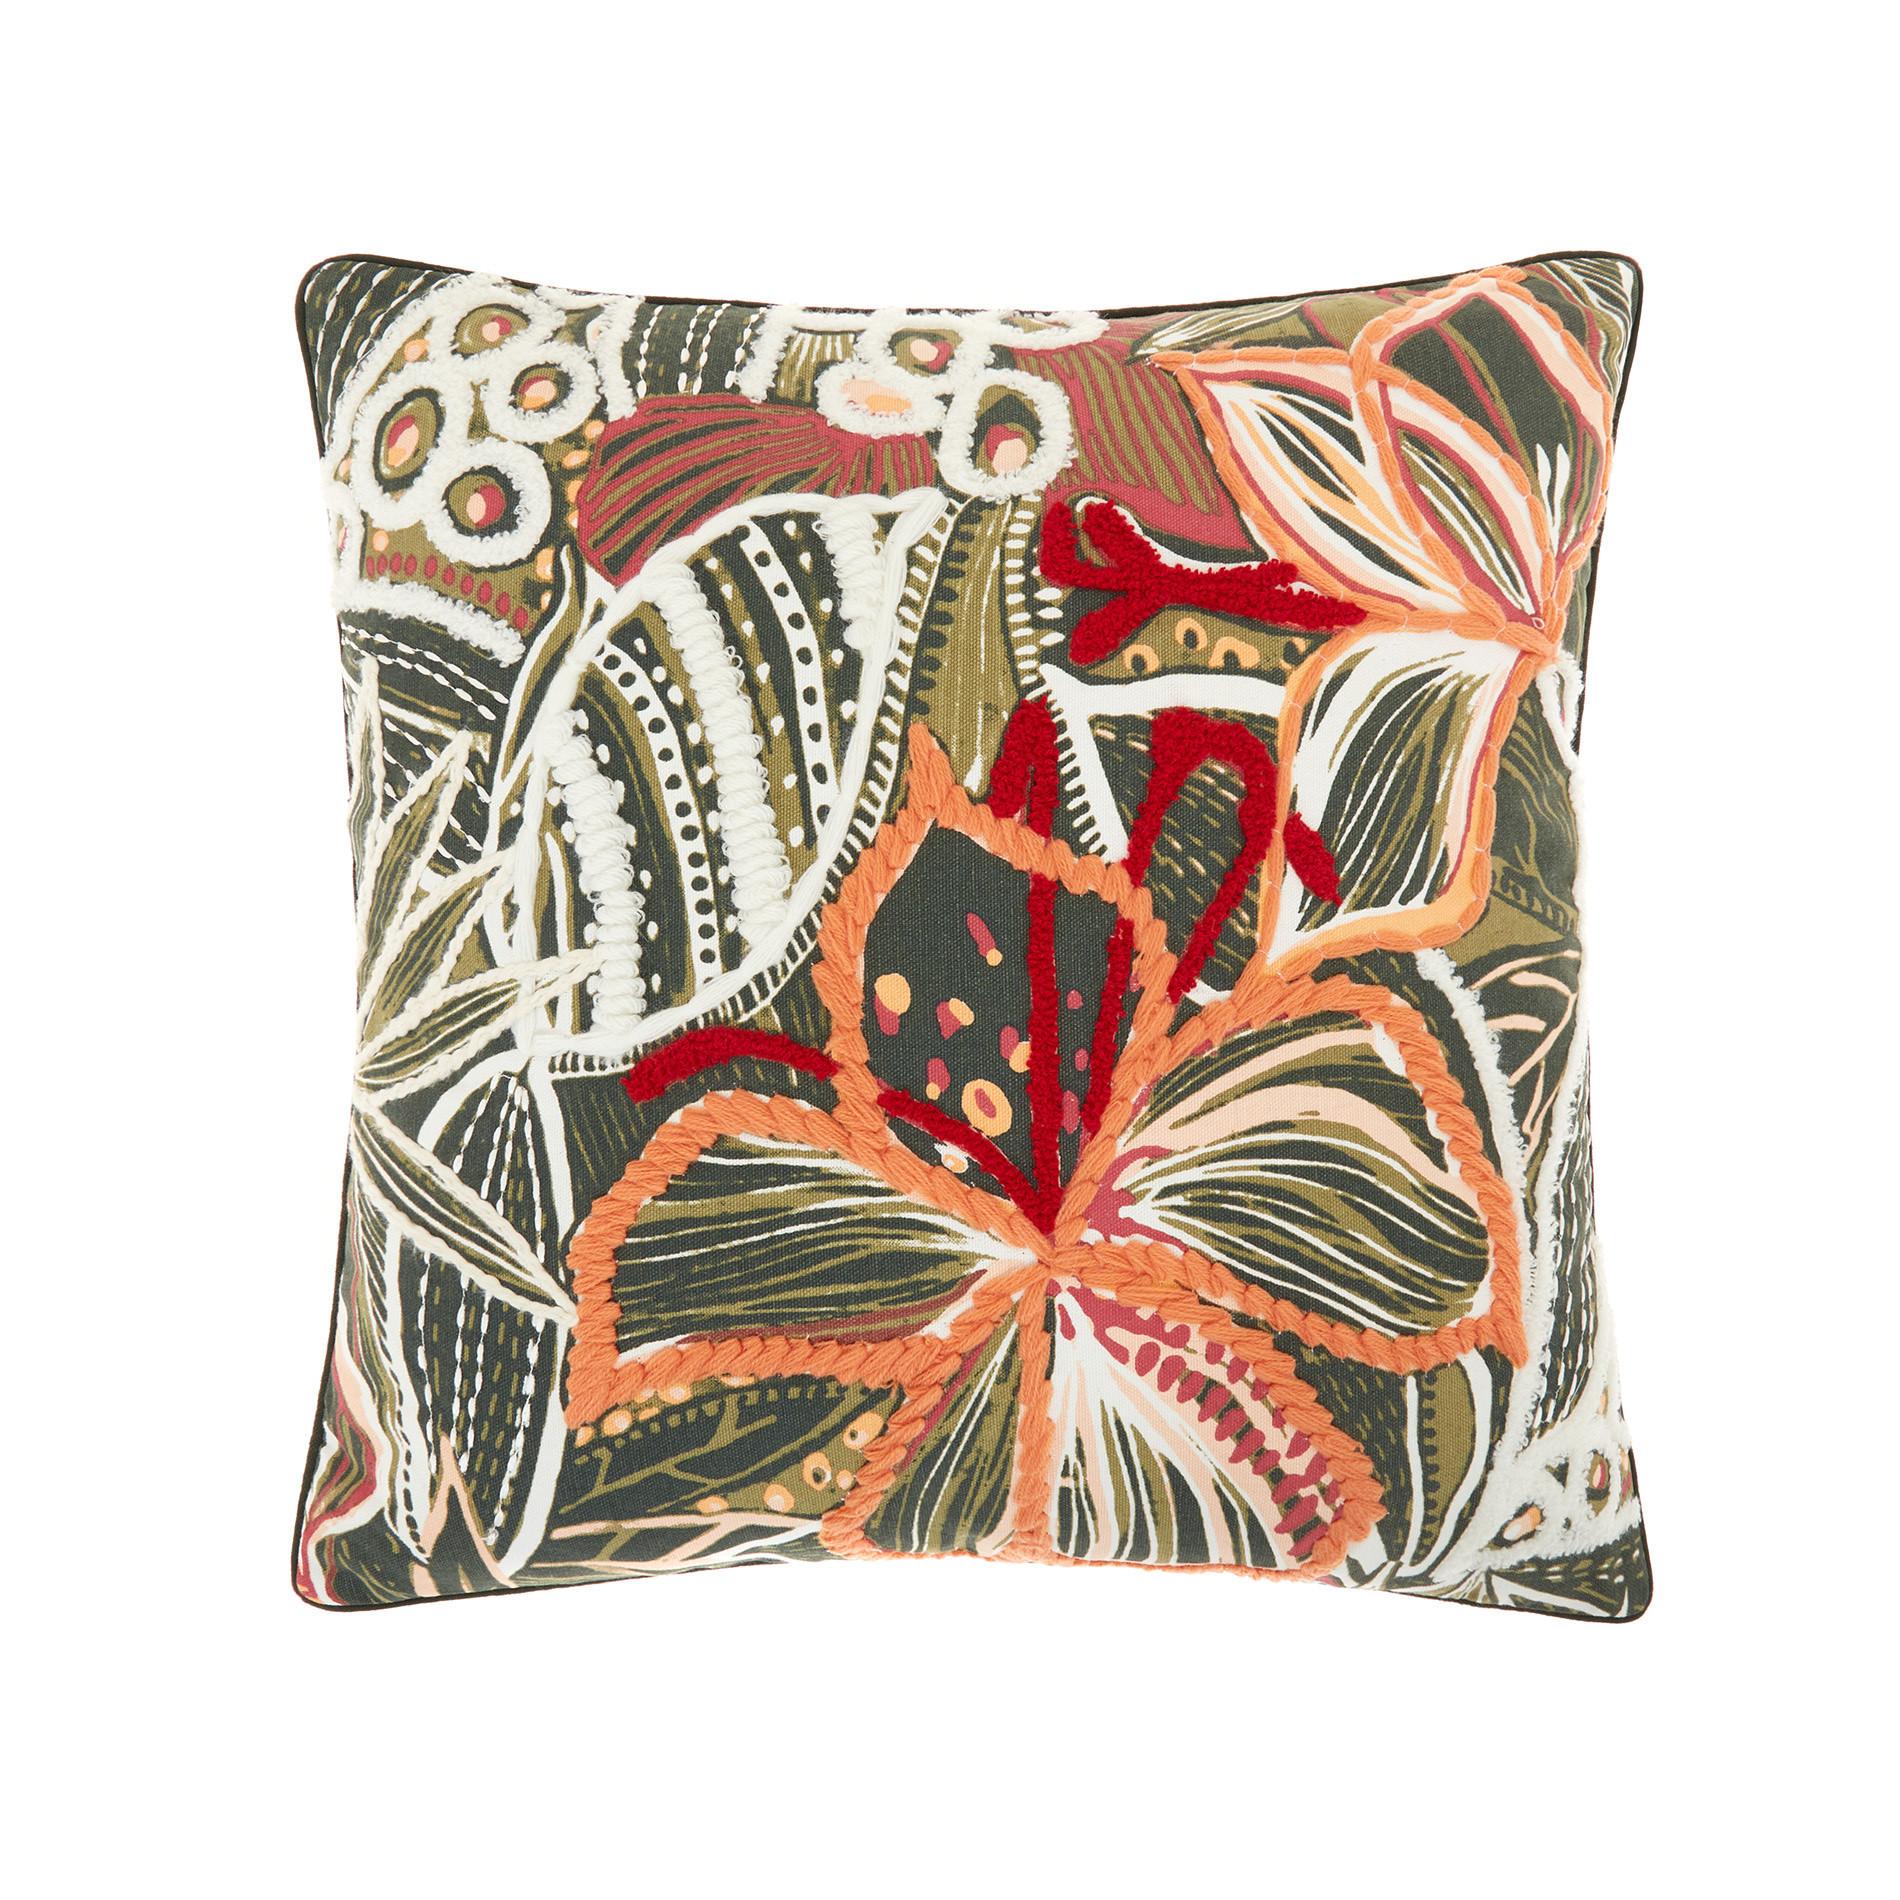 Cuscino ricamo foglie 45x45cm, Multicolor, large image number 0